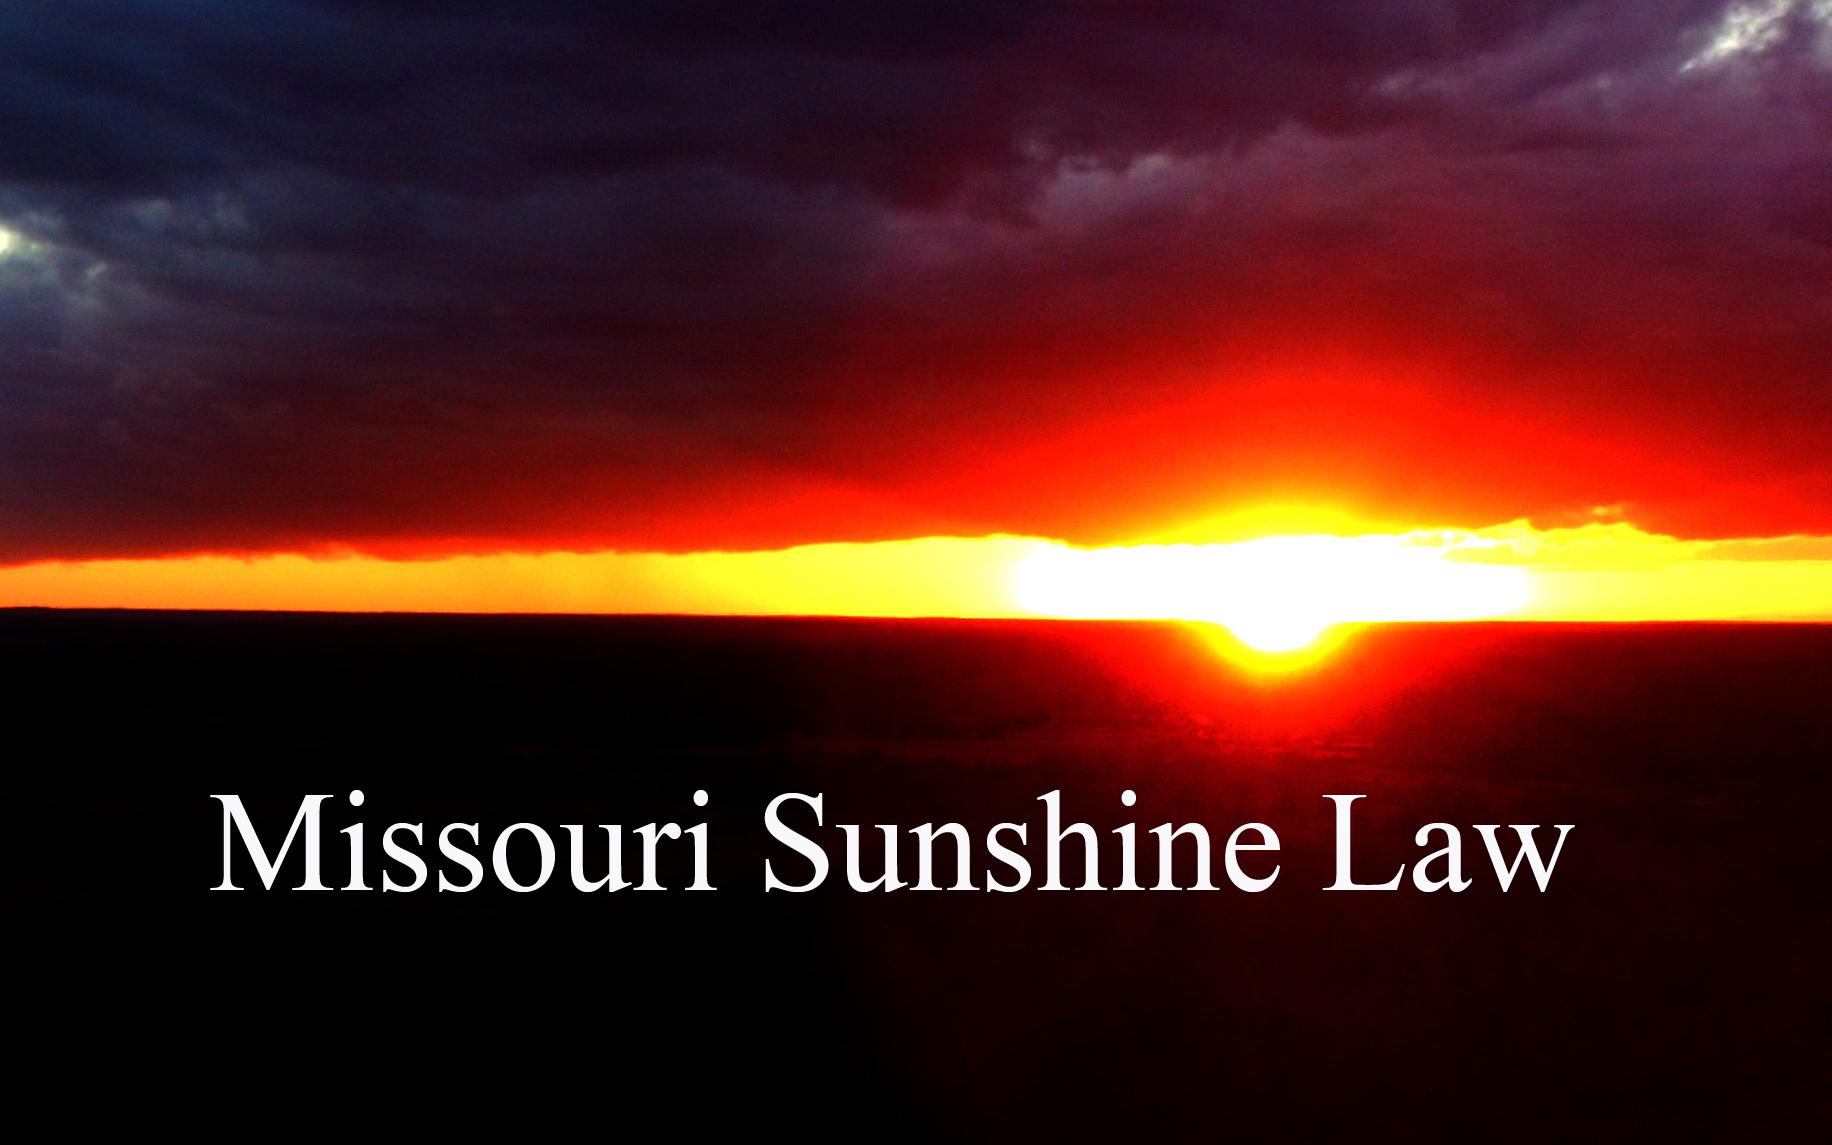 Missouri Sunshine Law (Clarion News Graphic)